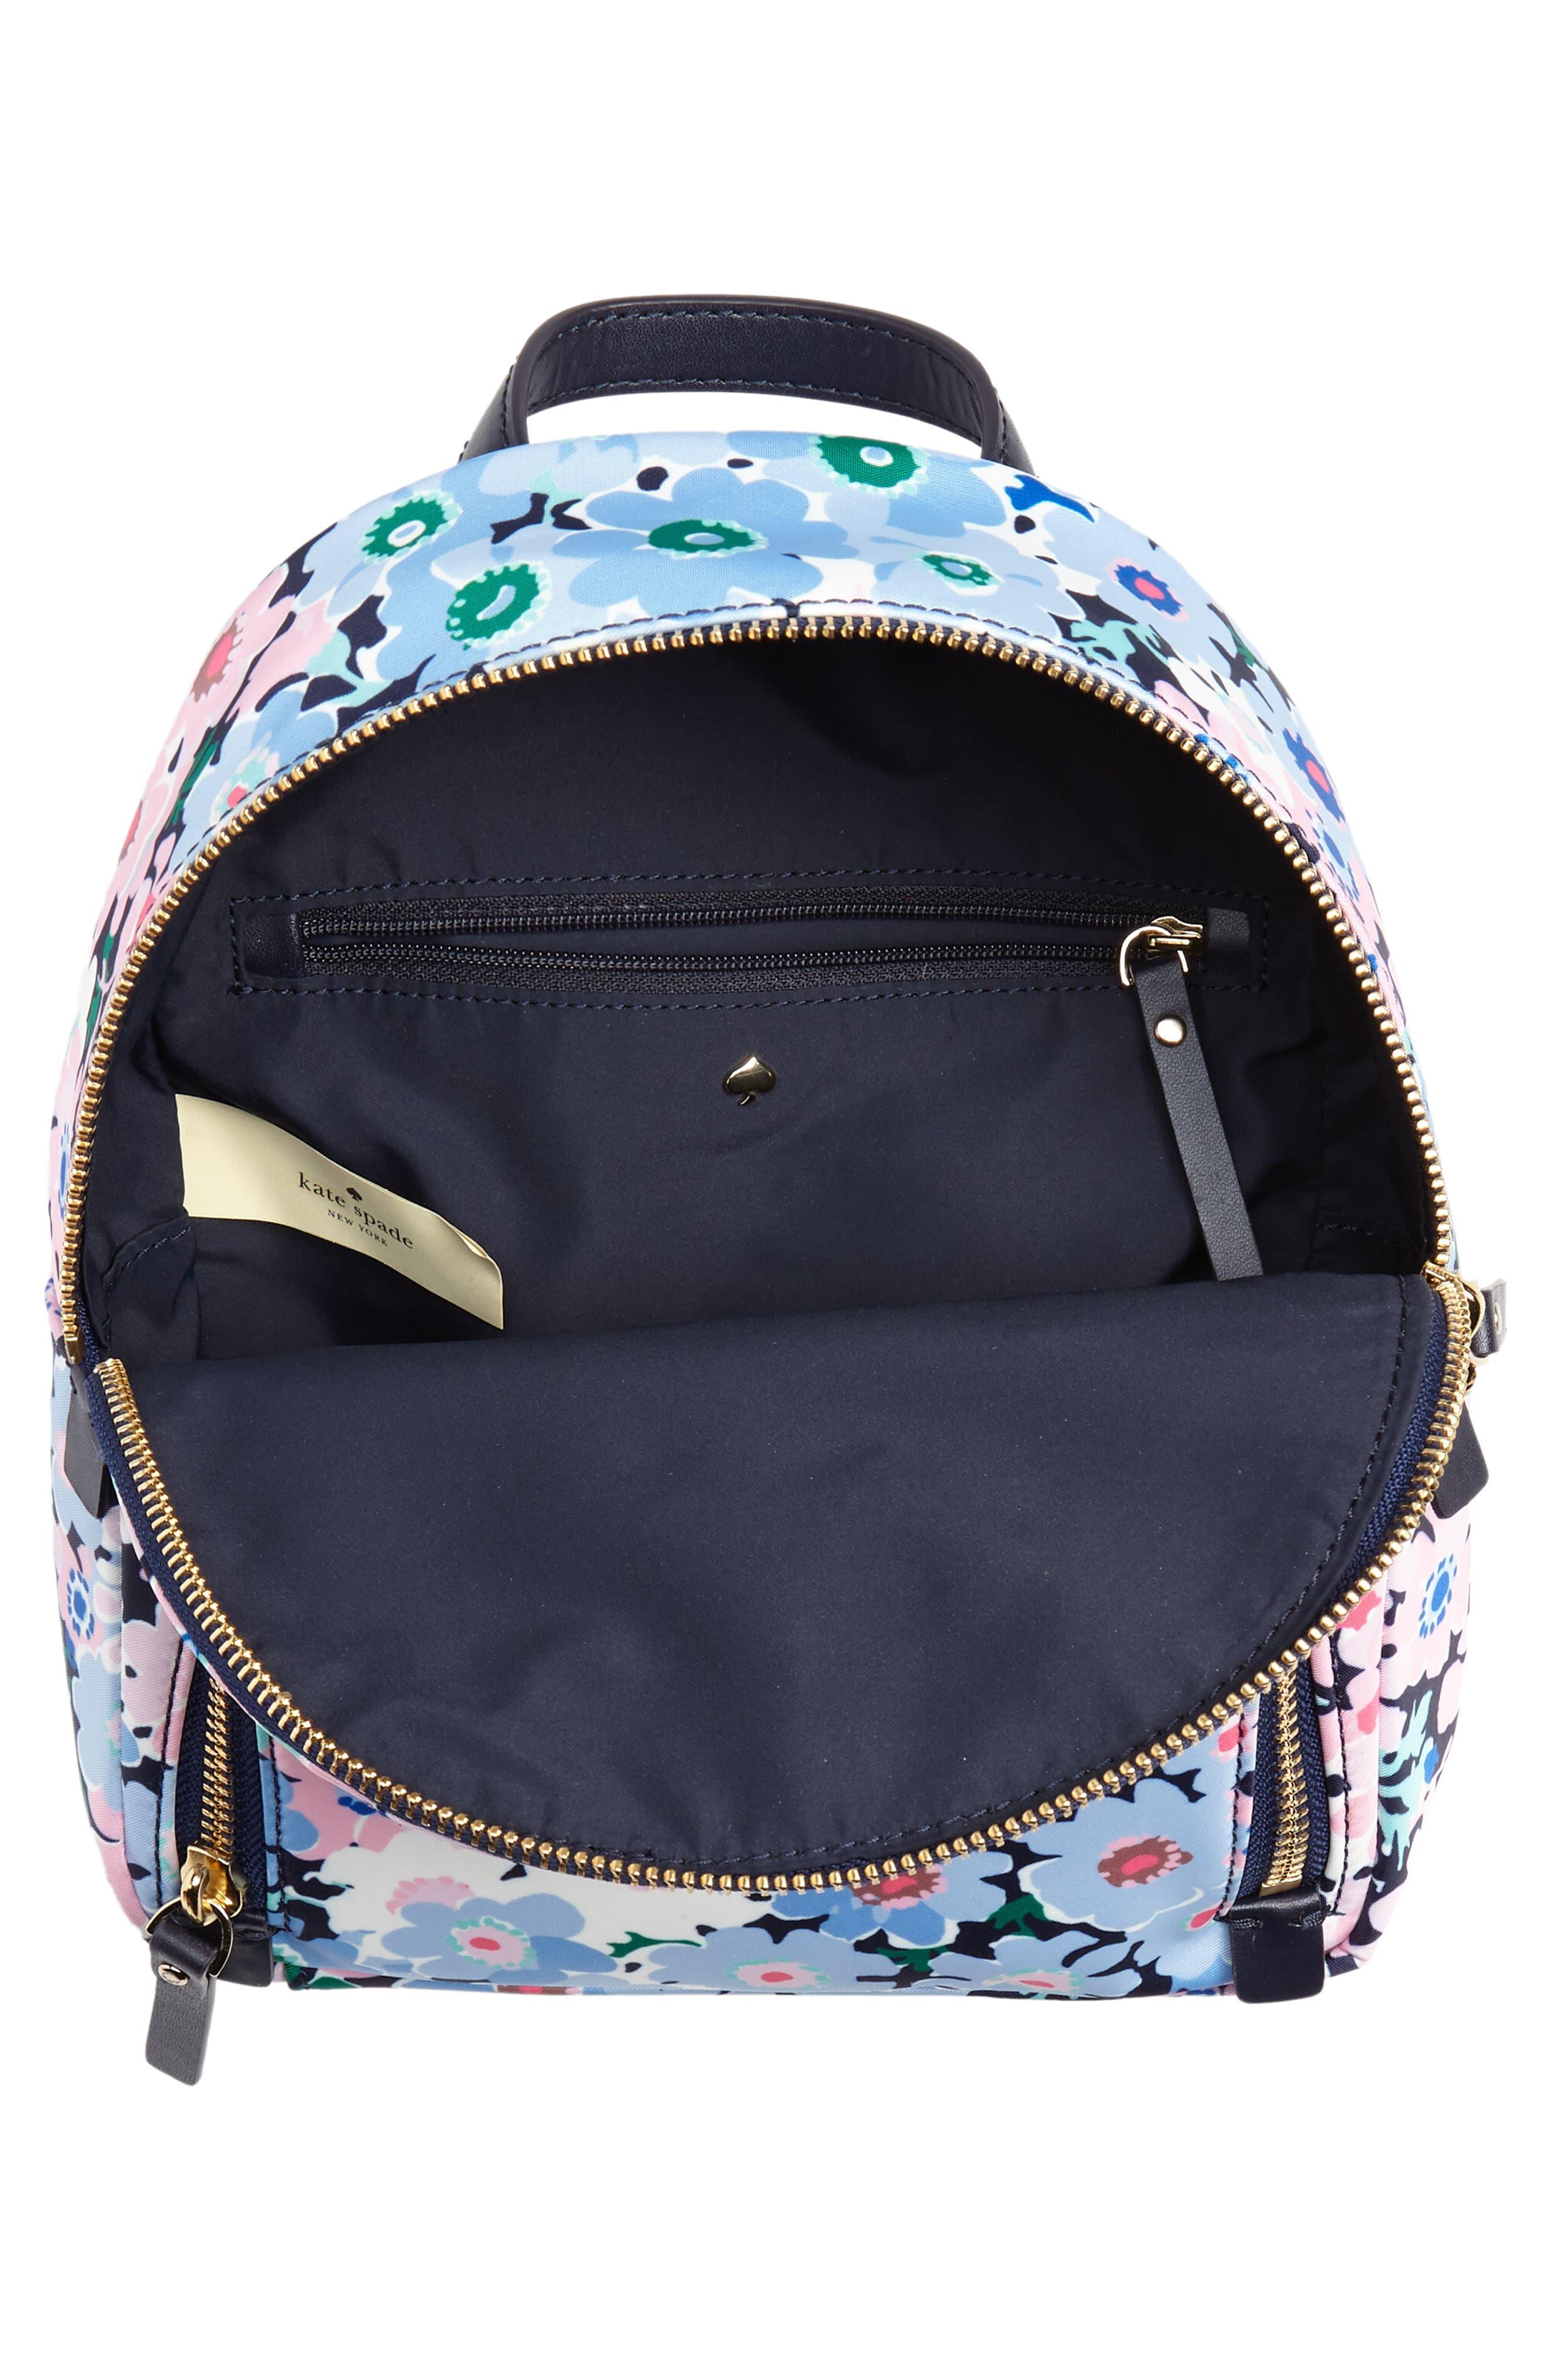 watson lane - daisy garden small hartley backpack,                             Alternate thumbnail 4, color,                             400